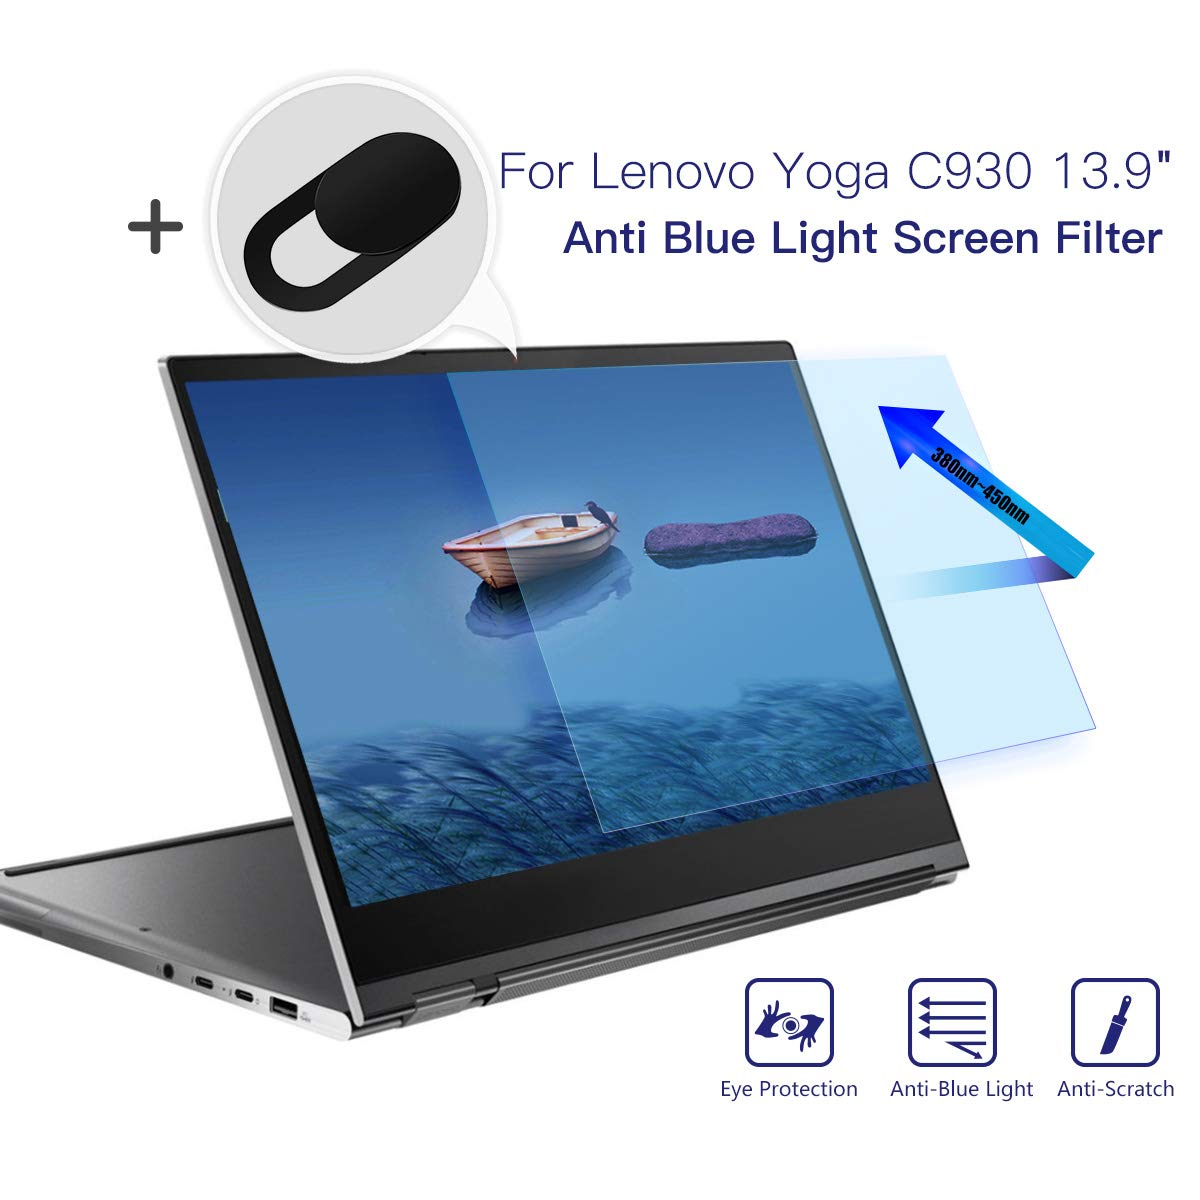 Lenovo Yoga 930 C930 Anti Blue Light Screen Filter, Anti Glare Screen Protector Eye Protection Blue Light Blocking Screen Protector for 13.9